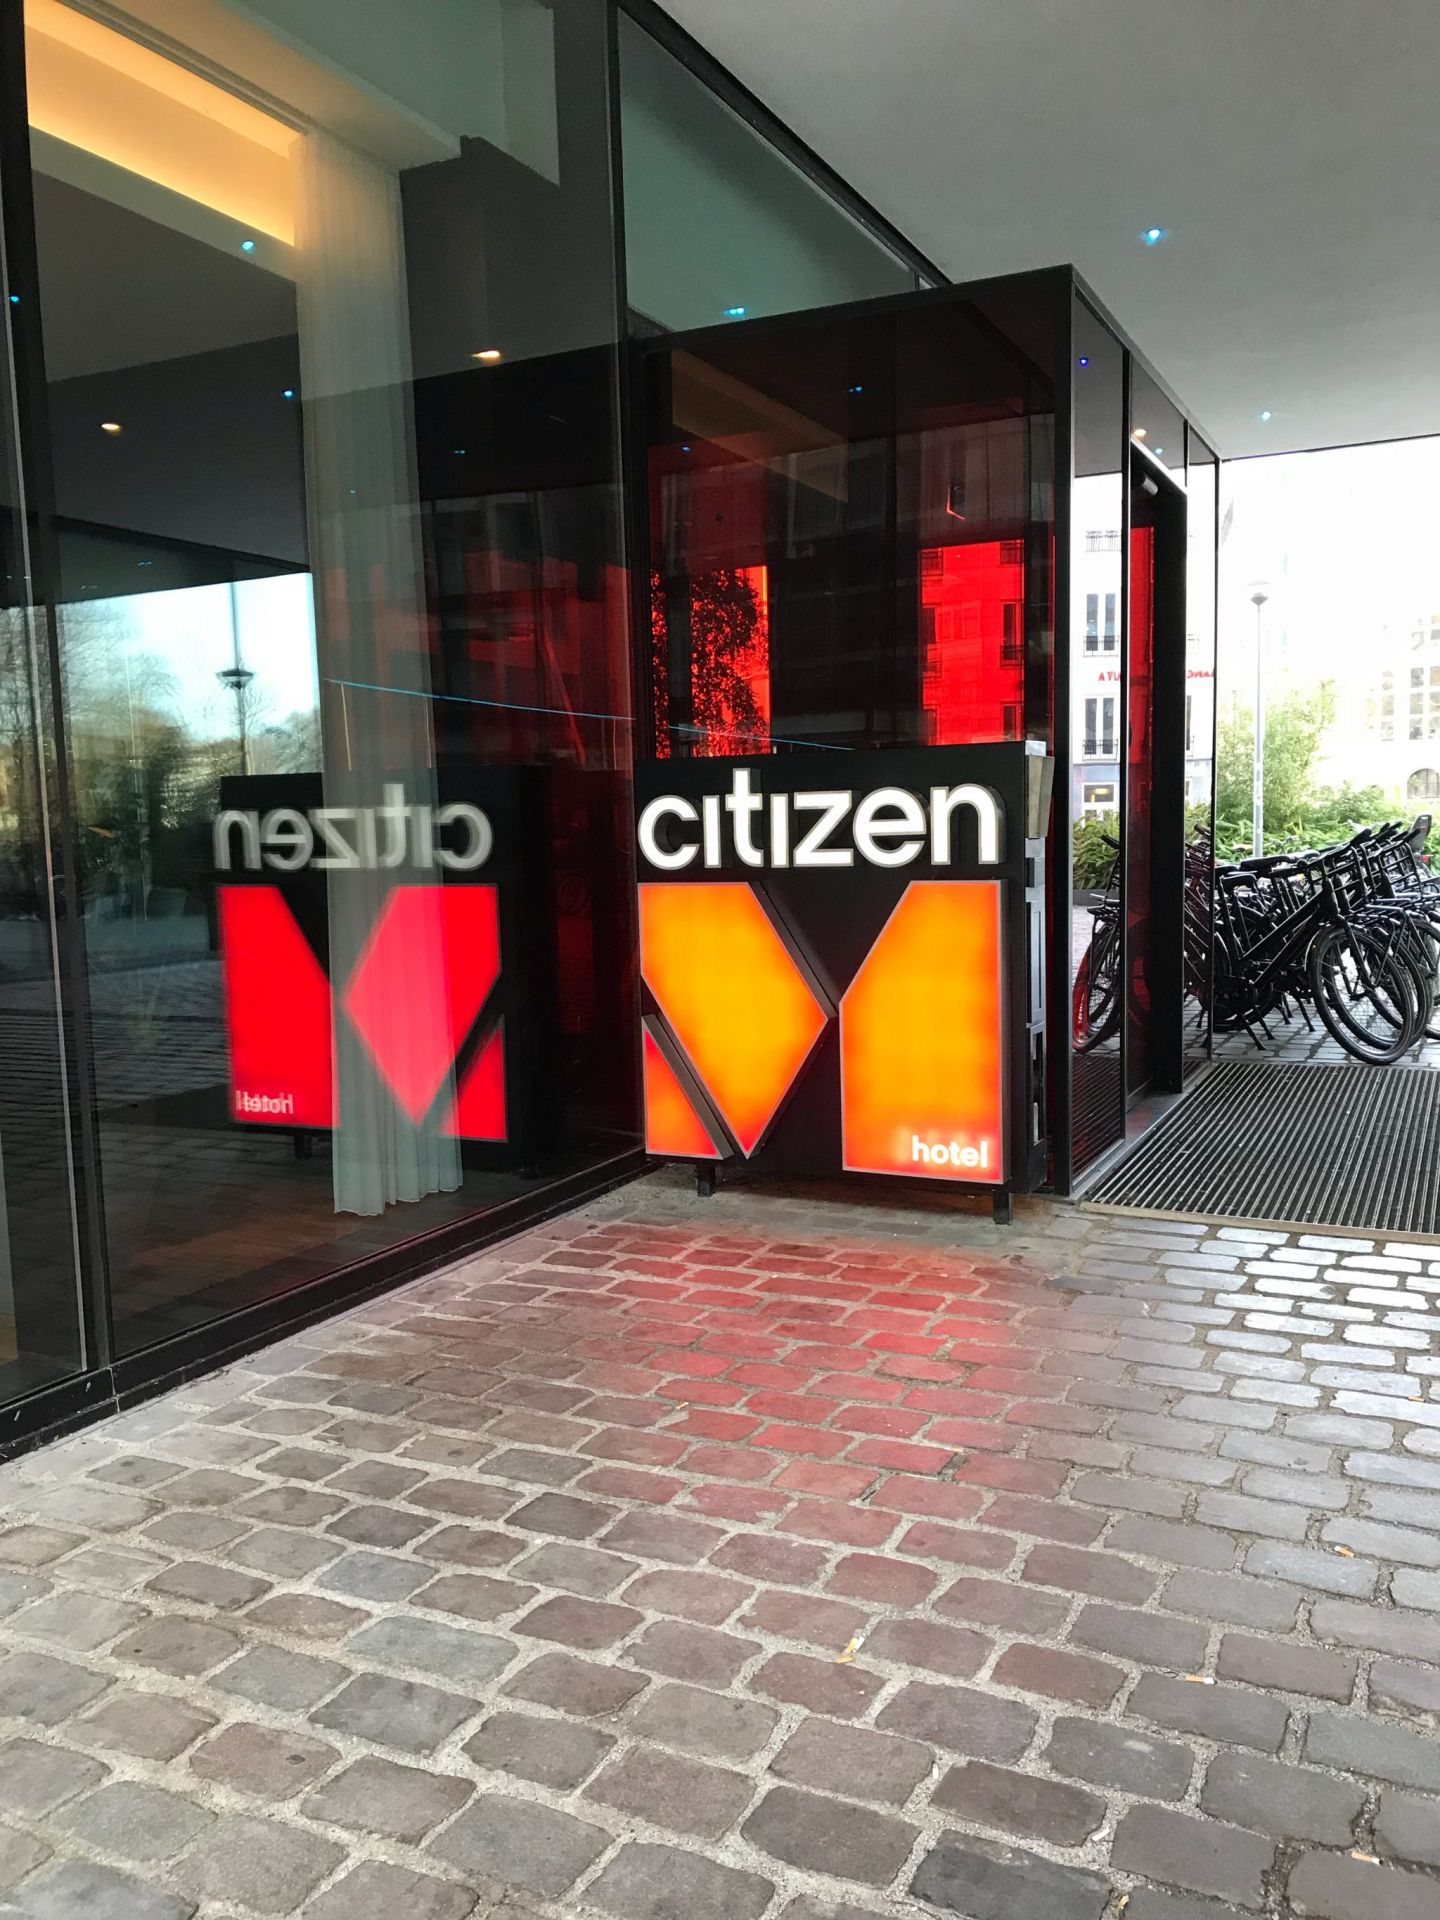 Citizen M Outside View Rotterdam